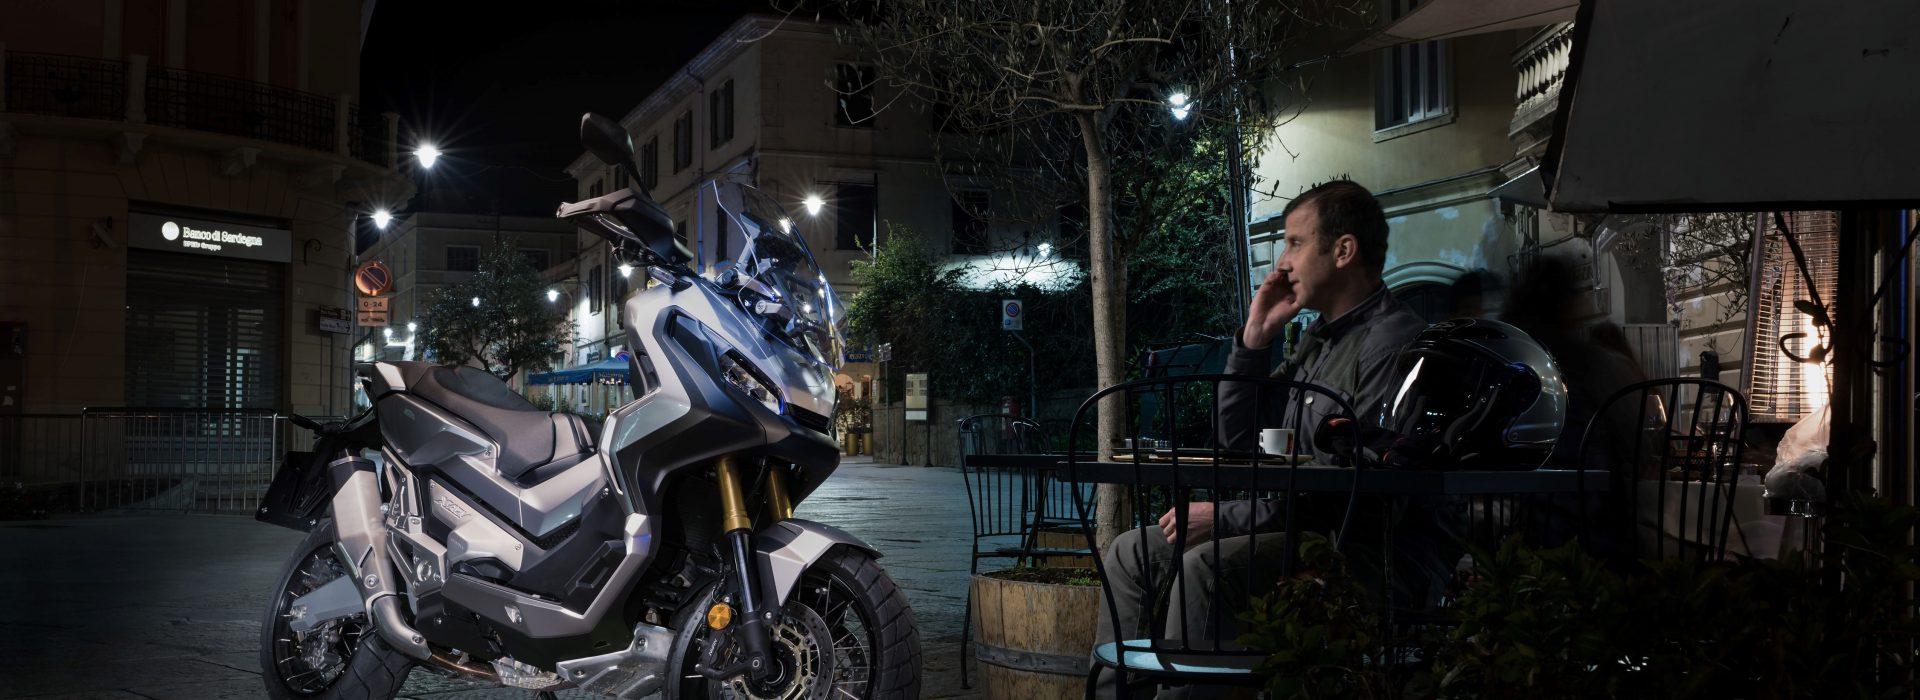 Sardinia Press Event - 17YM X-ADV